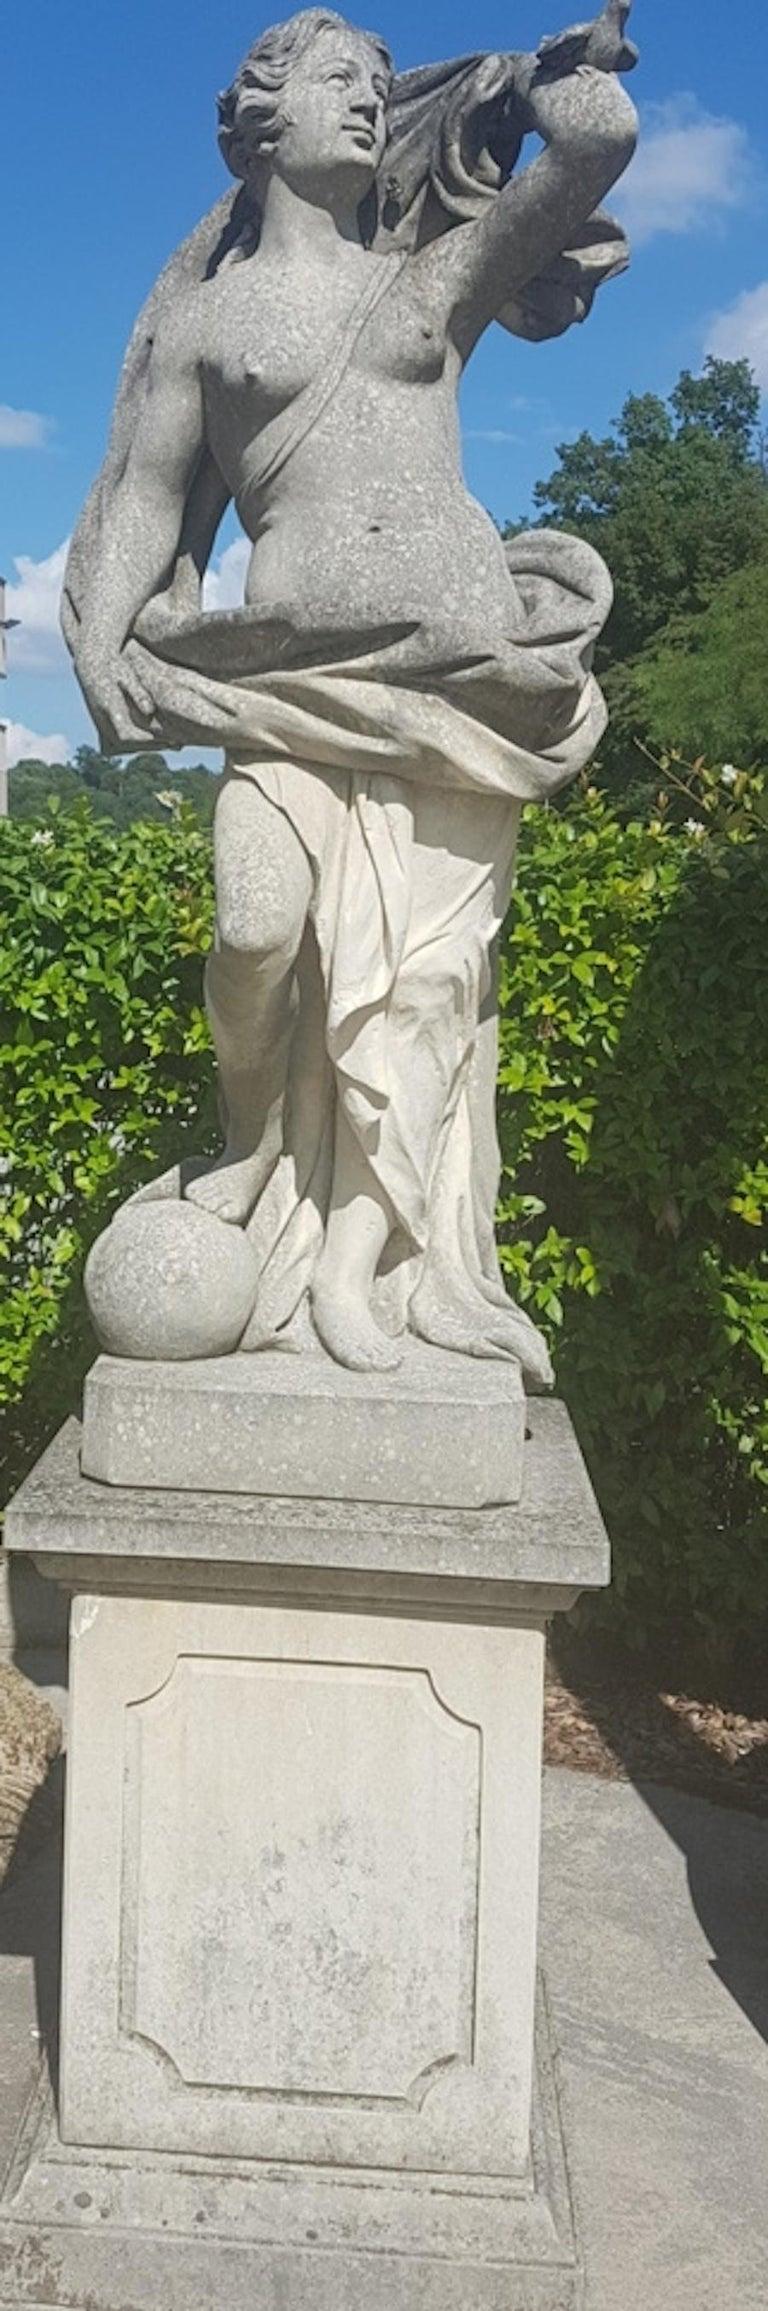 Italian Stone Garden Sculptures of Aria Mythological Subject For Sale 1